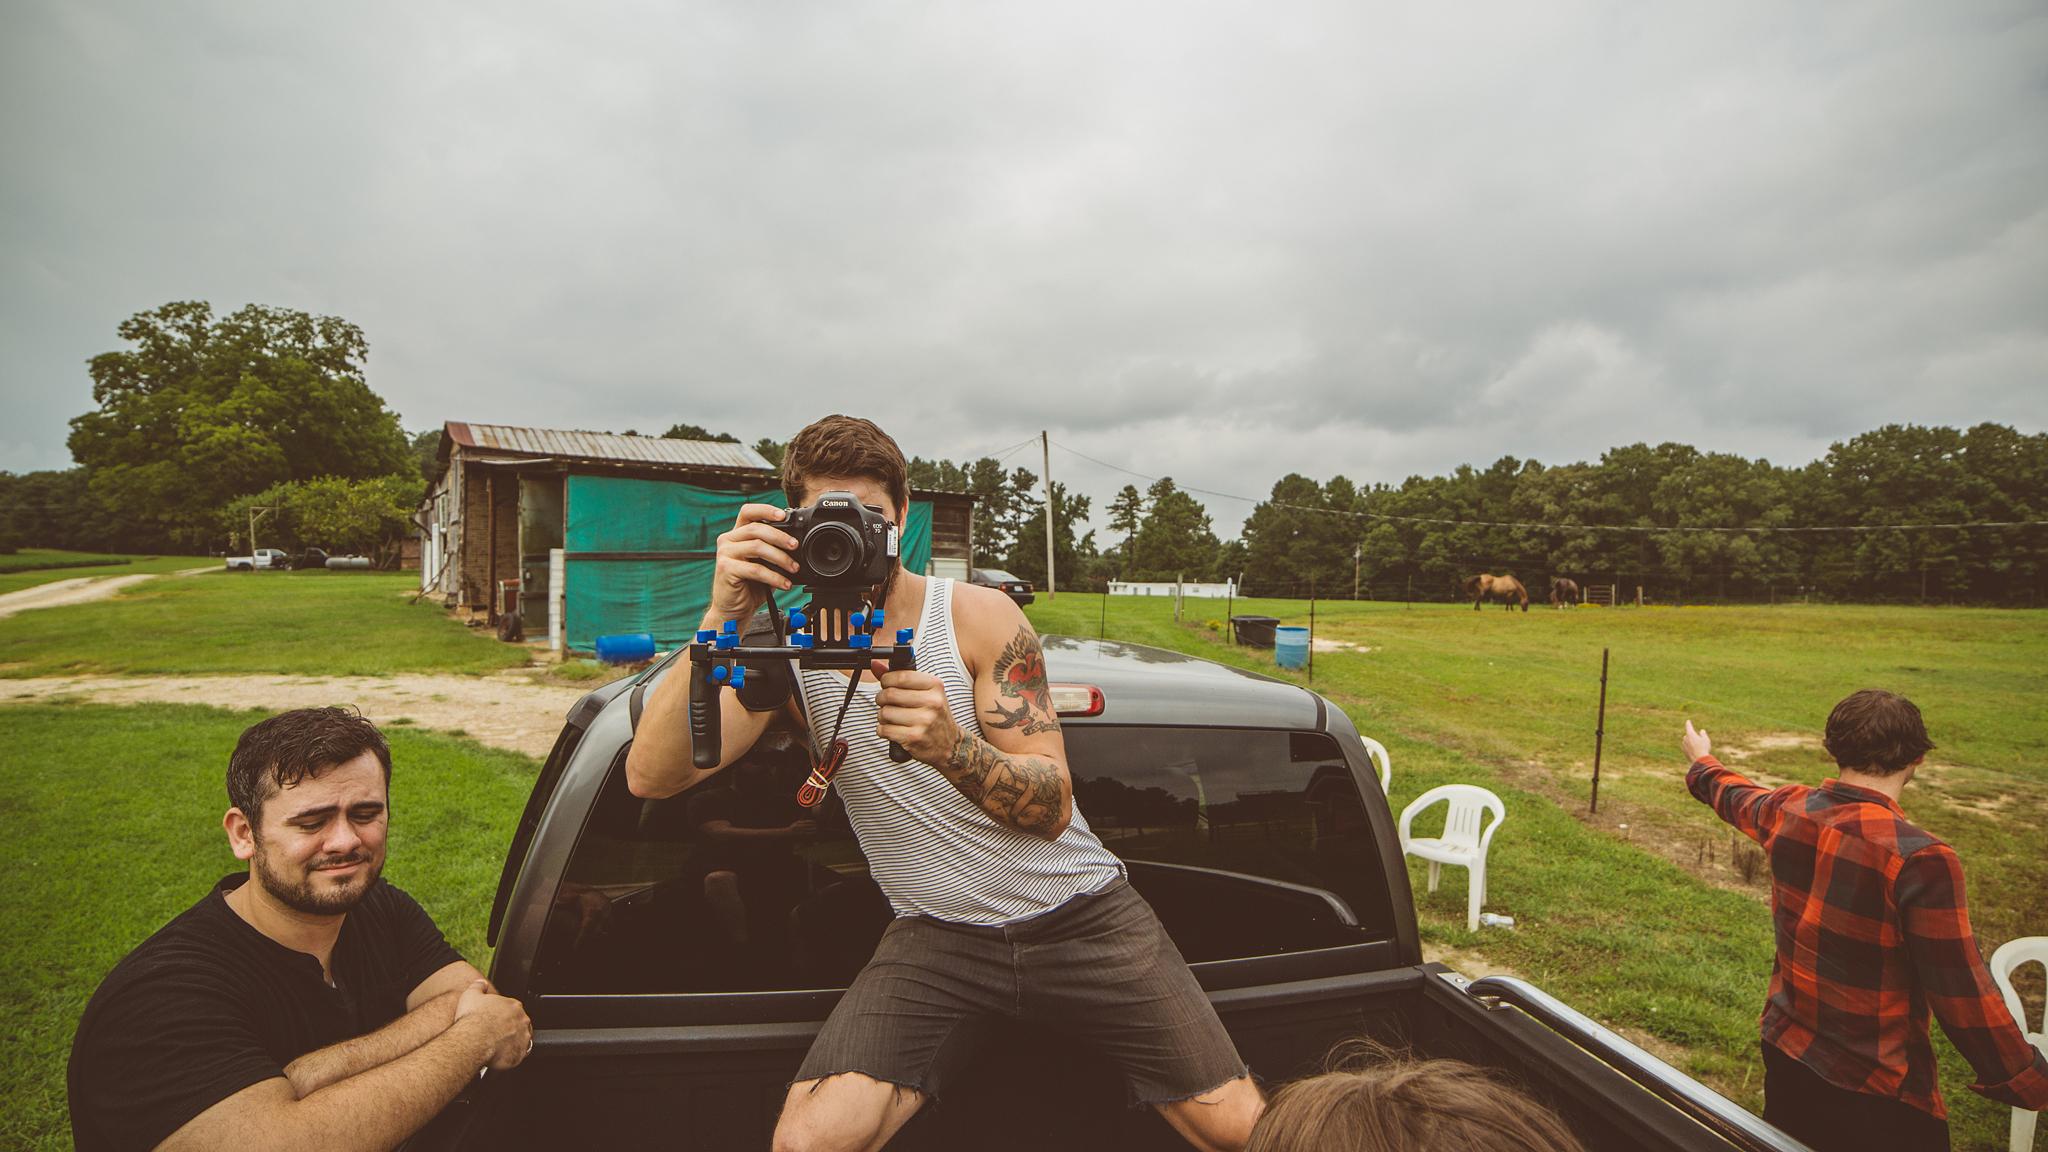 Shootin shots of shootin shots (Matt looks unamused while Blake directs us to the action) :)